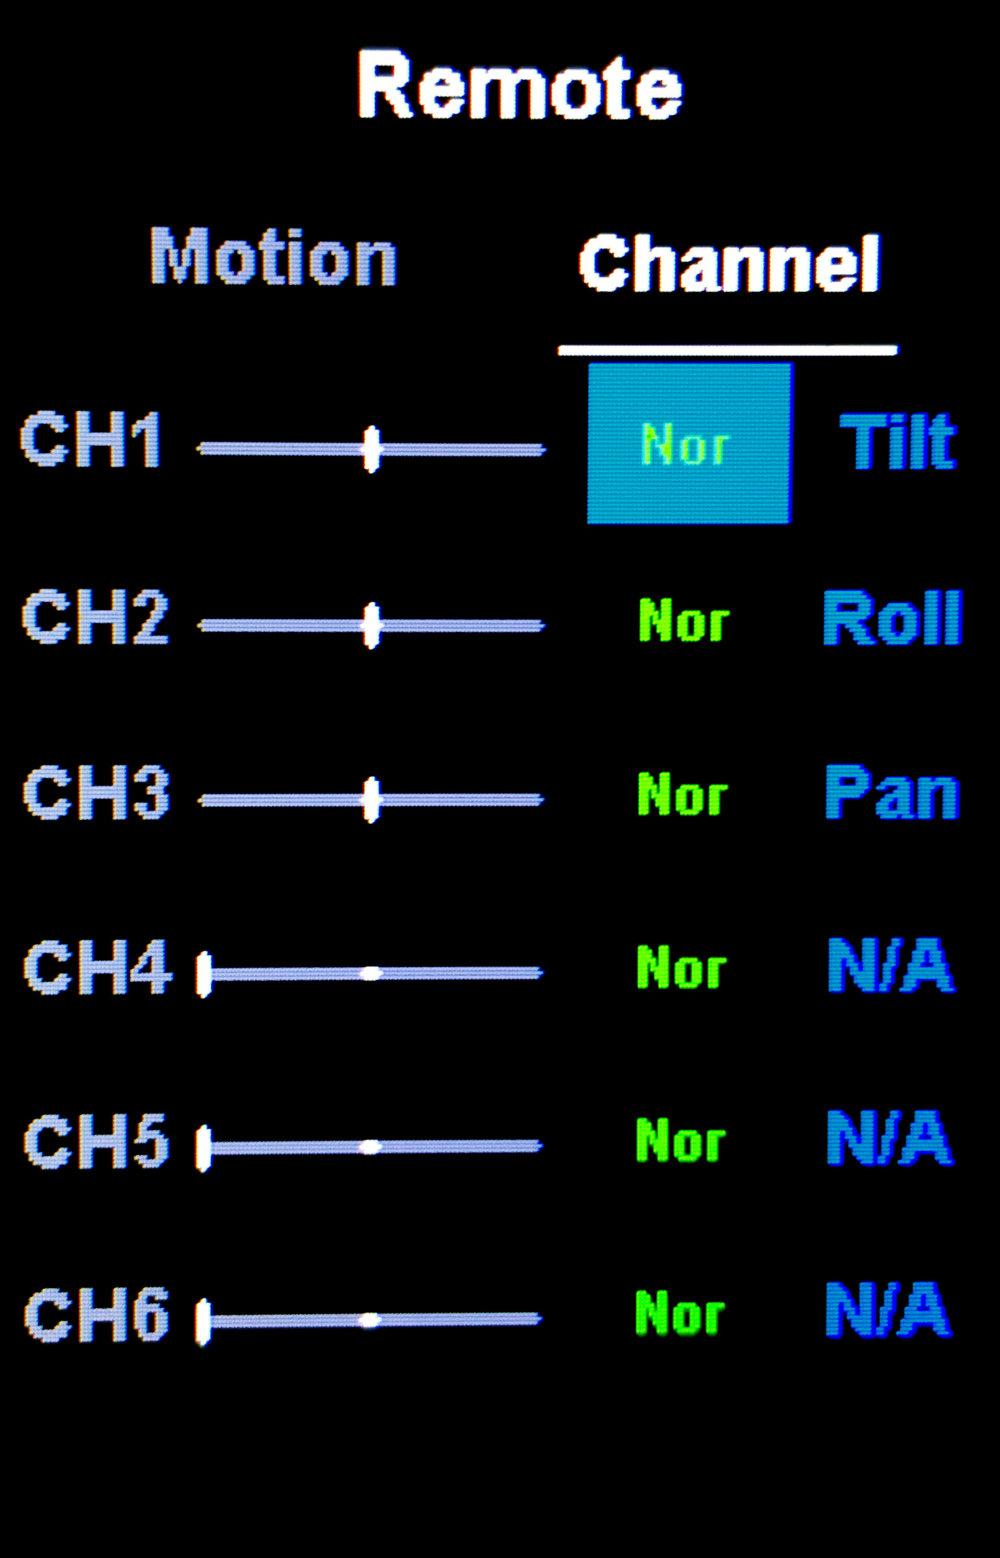 Remote > Channel